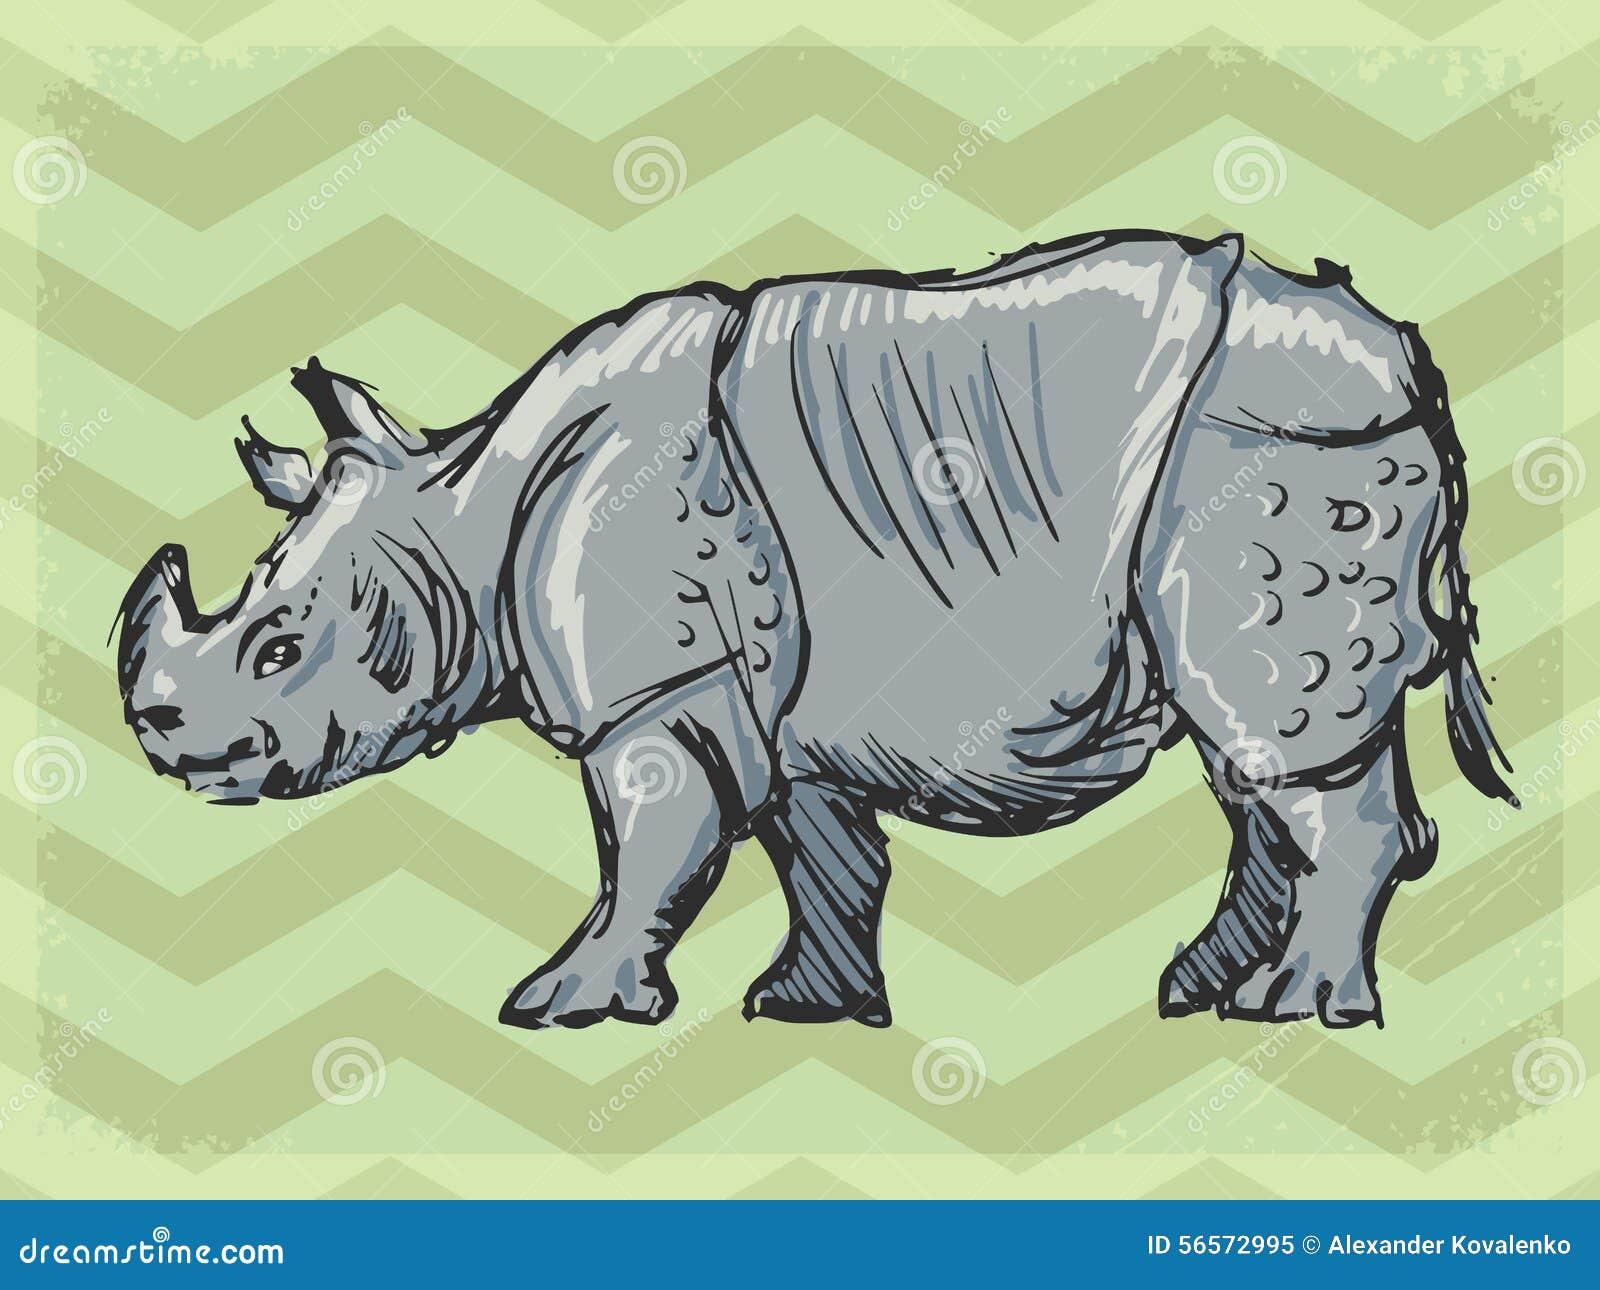 Download Εκλεκτής ποιότητας υπόβαθρο με το ρινόκερο Απεικόνιση αποθεμάτων - εικονογραφία από αναδρομικός, antiquate: 56572995